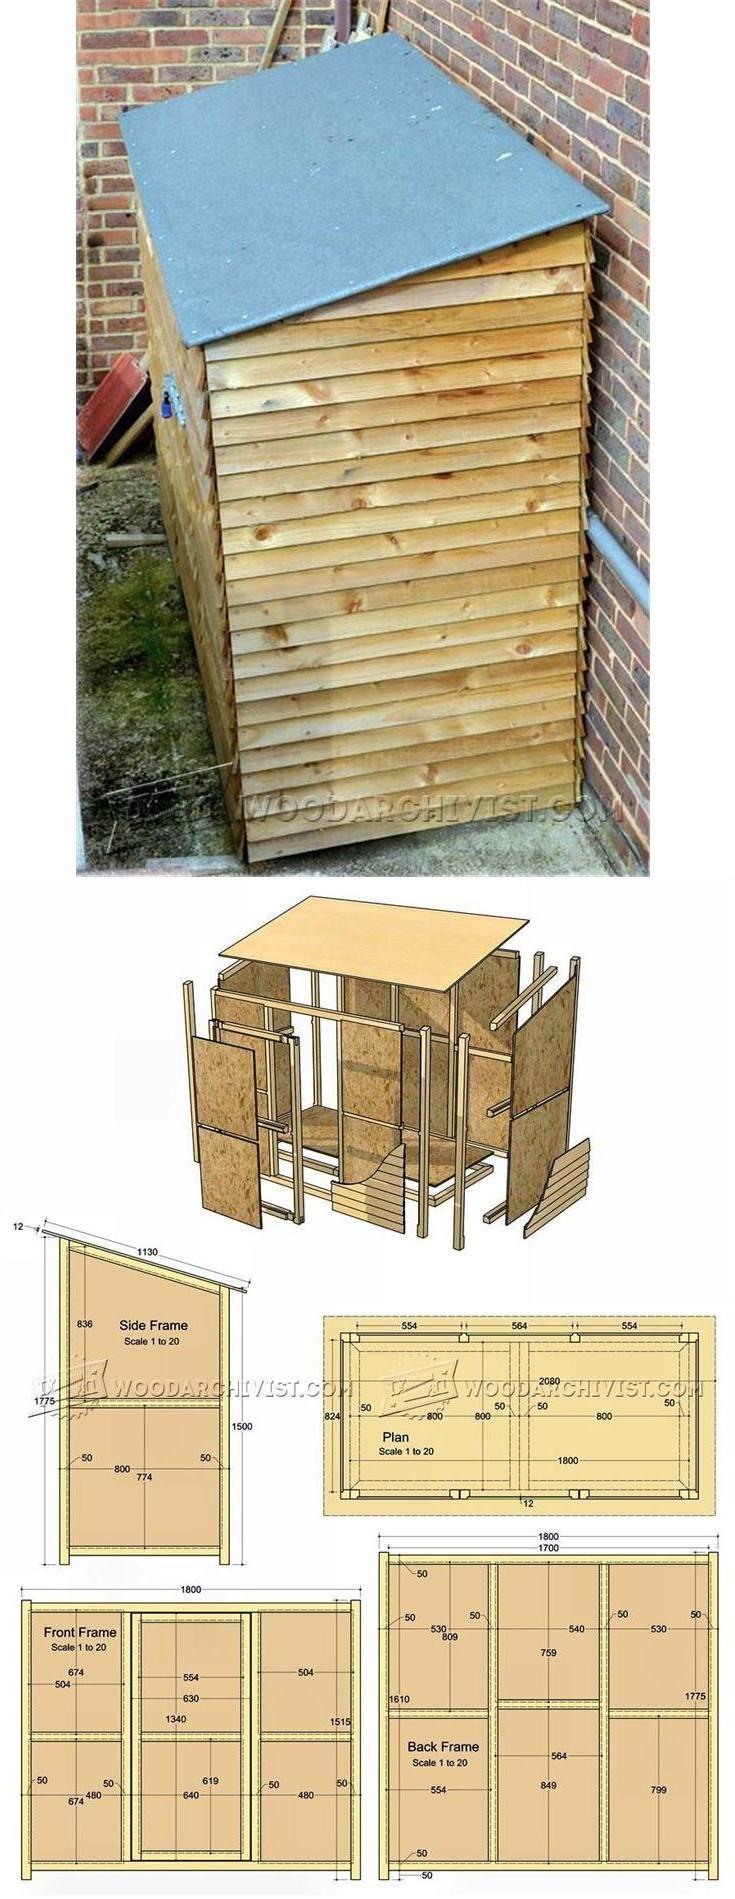 Garden Store Plans - Outdoor Plans and Projects | WoodArchivist.com